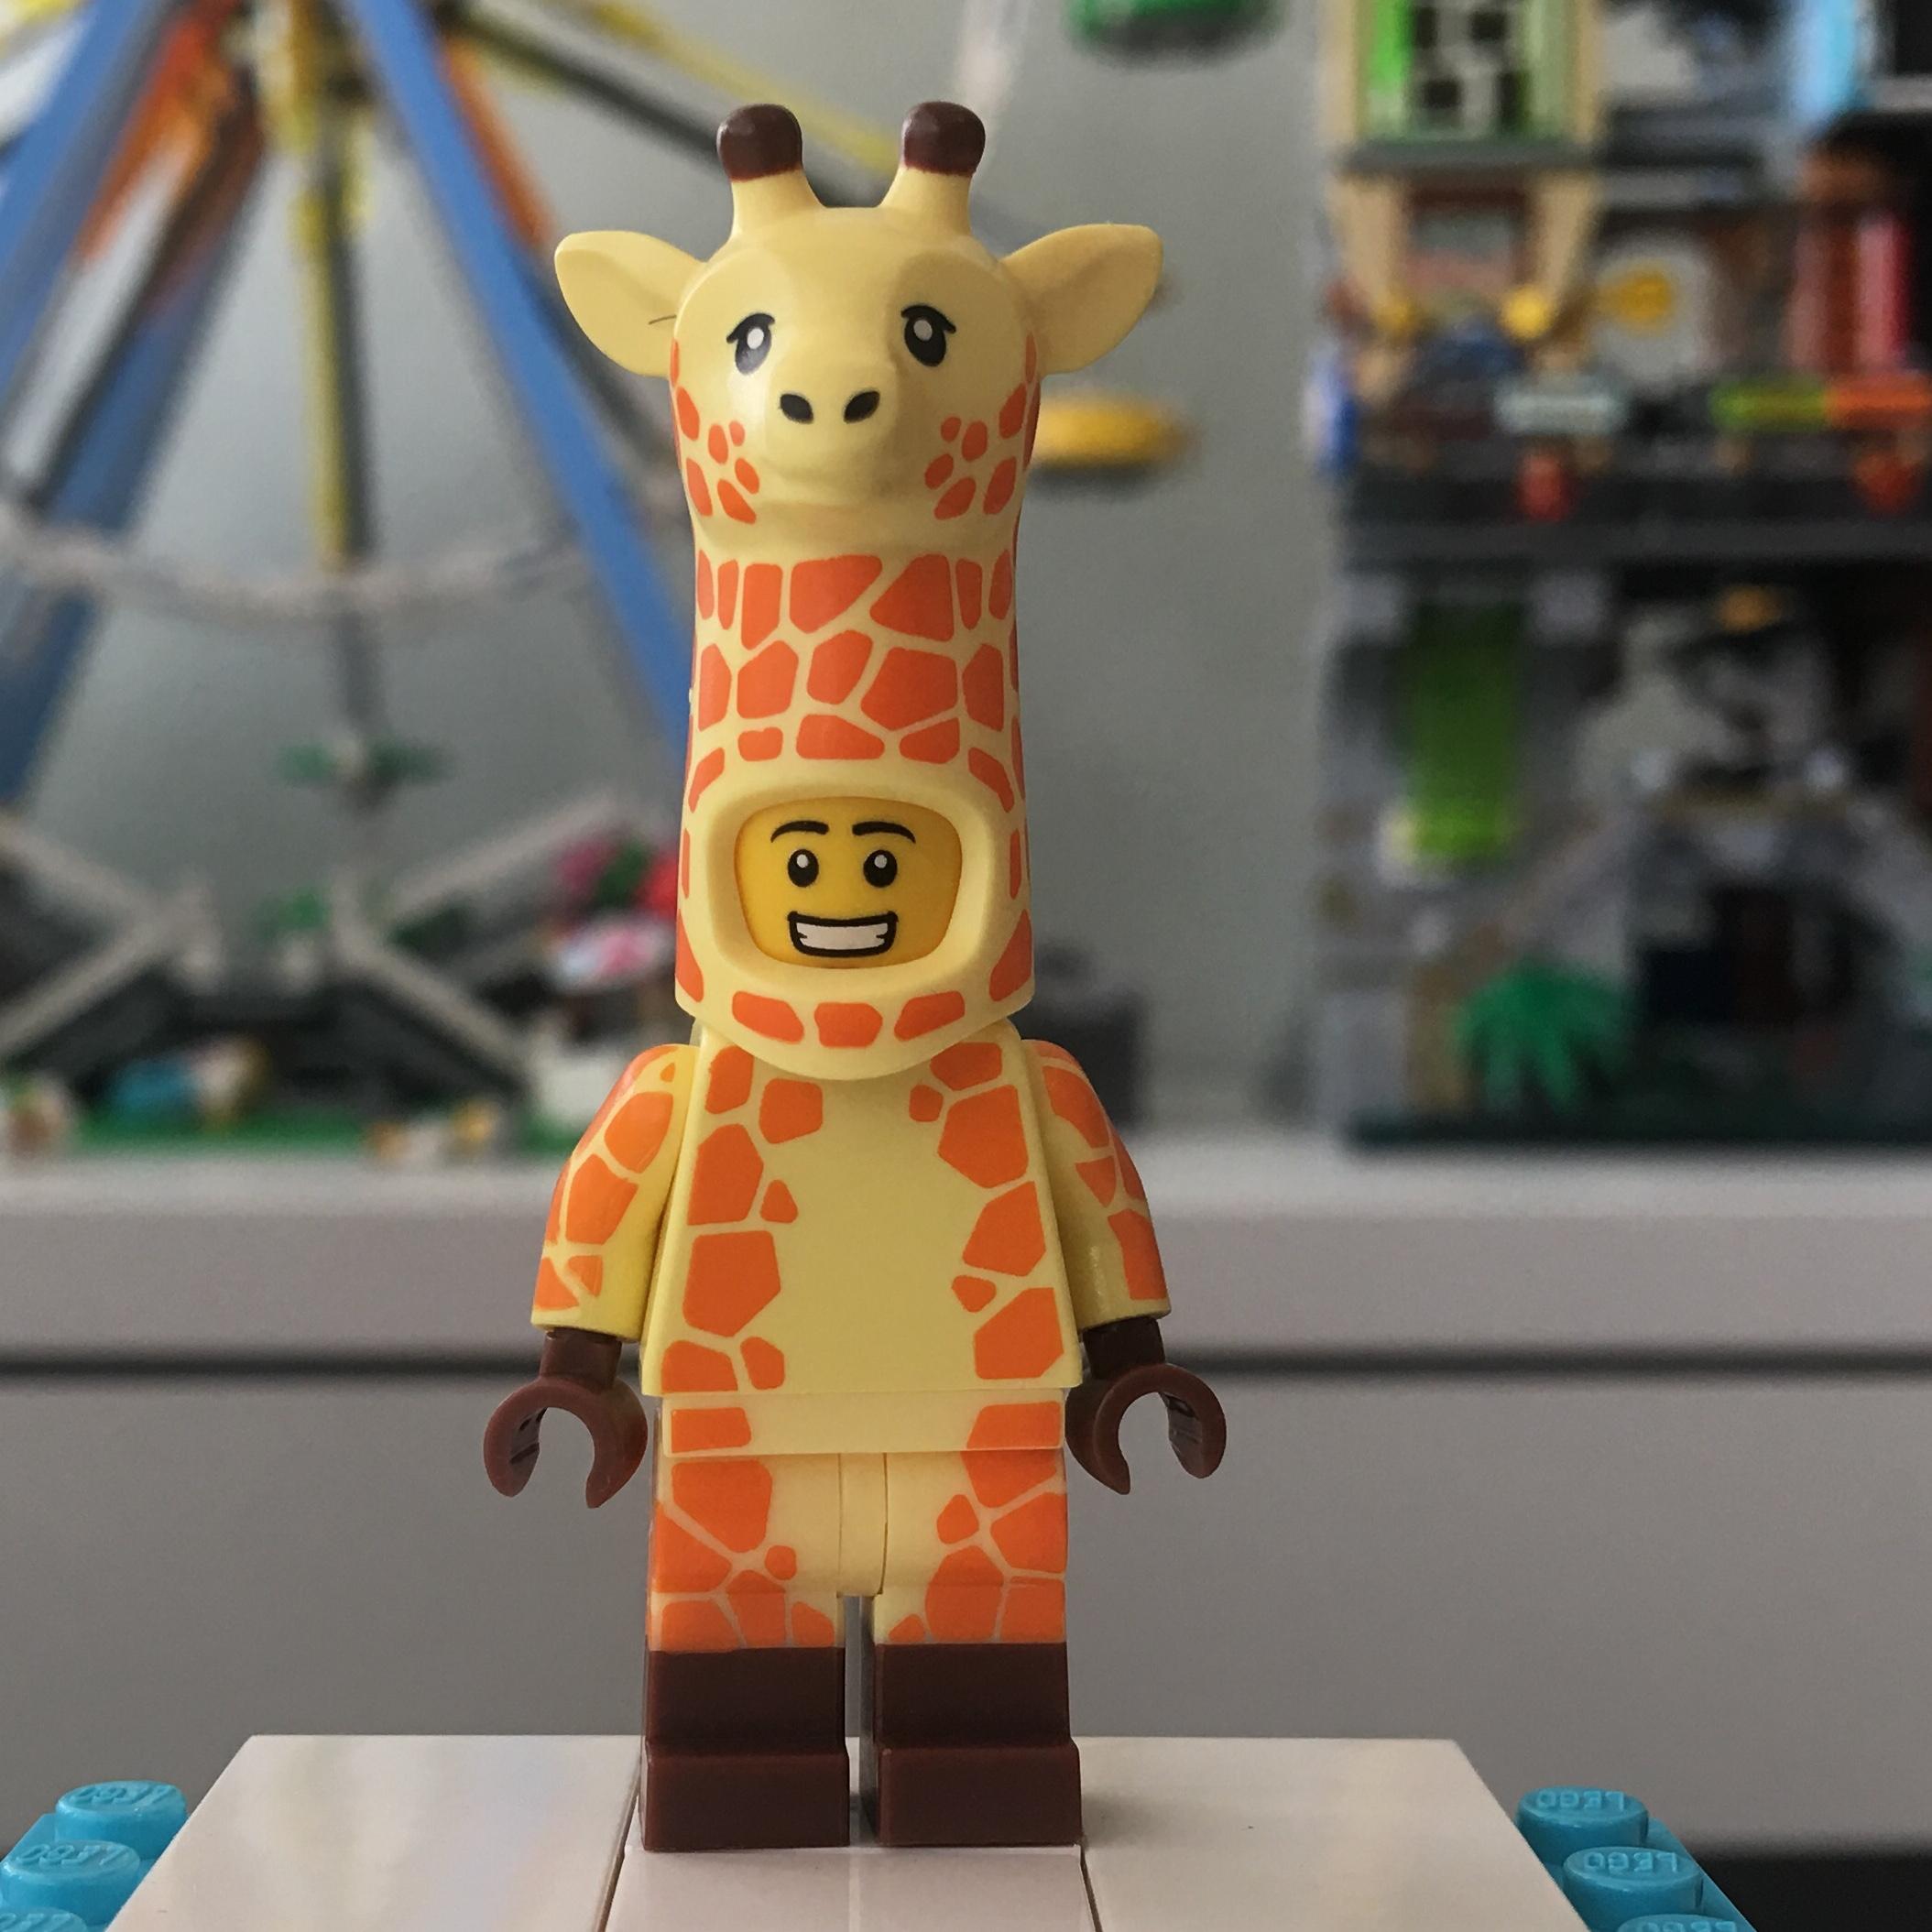 71023 Lego THE LEGO Movie 2 Series Minifigures Giraffe Guy